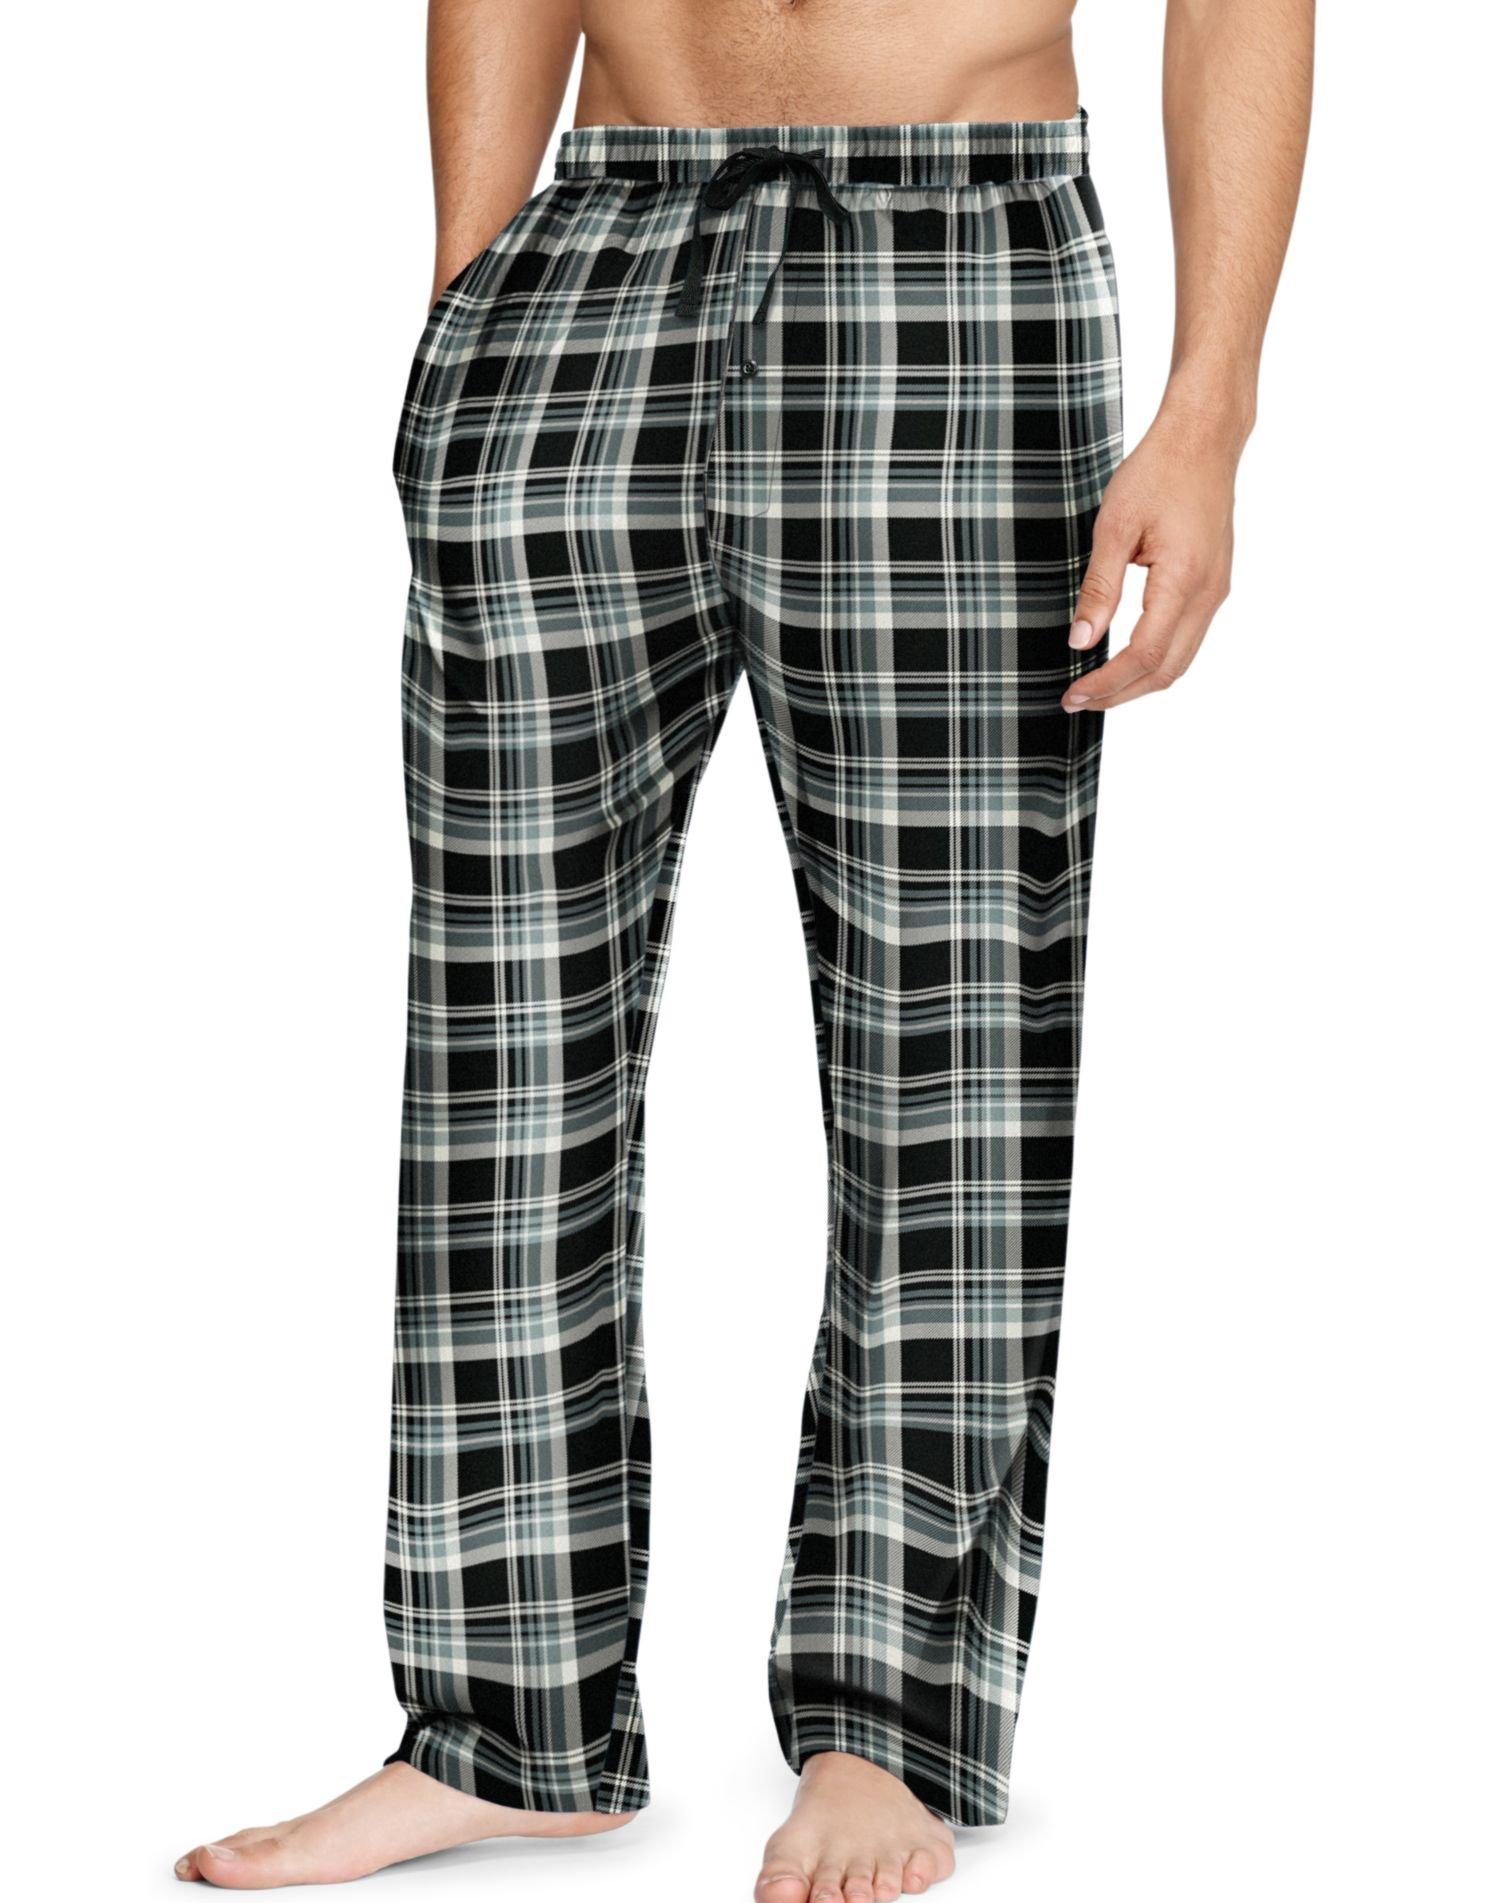 Hanes Men`s Flannel Pants with Comfort Flex Waistband, M, Grey/Navy